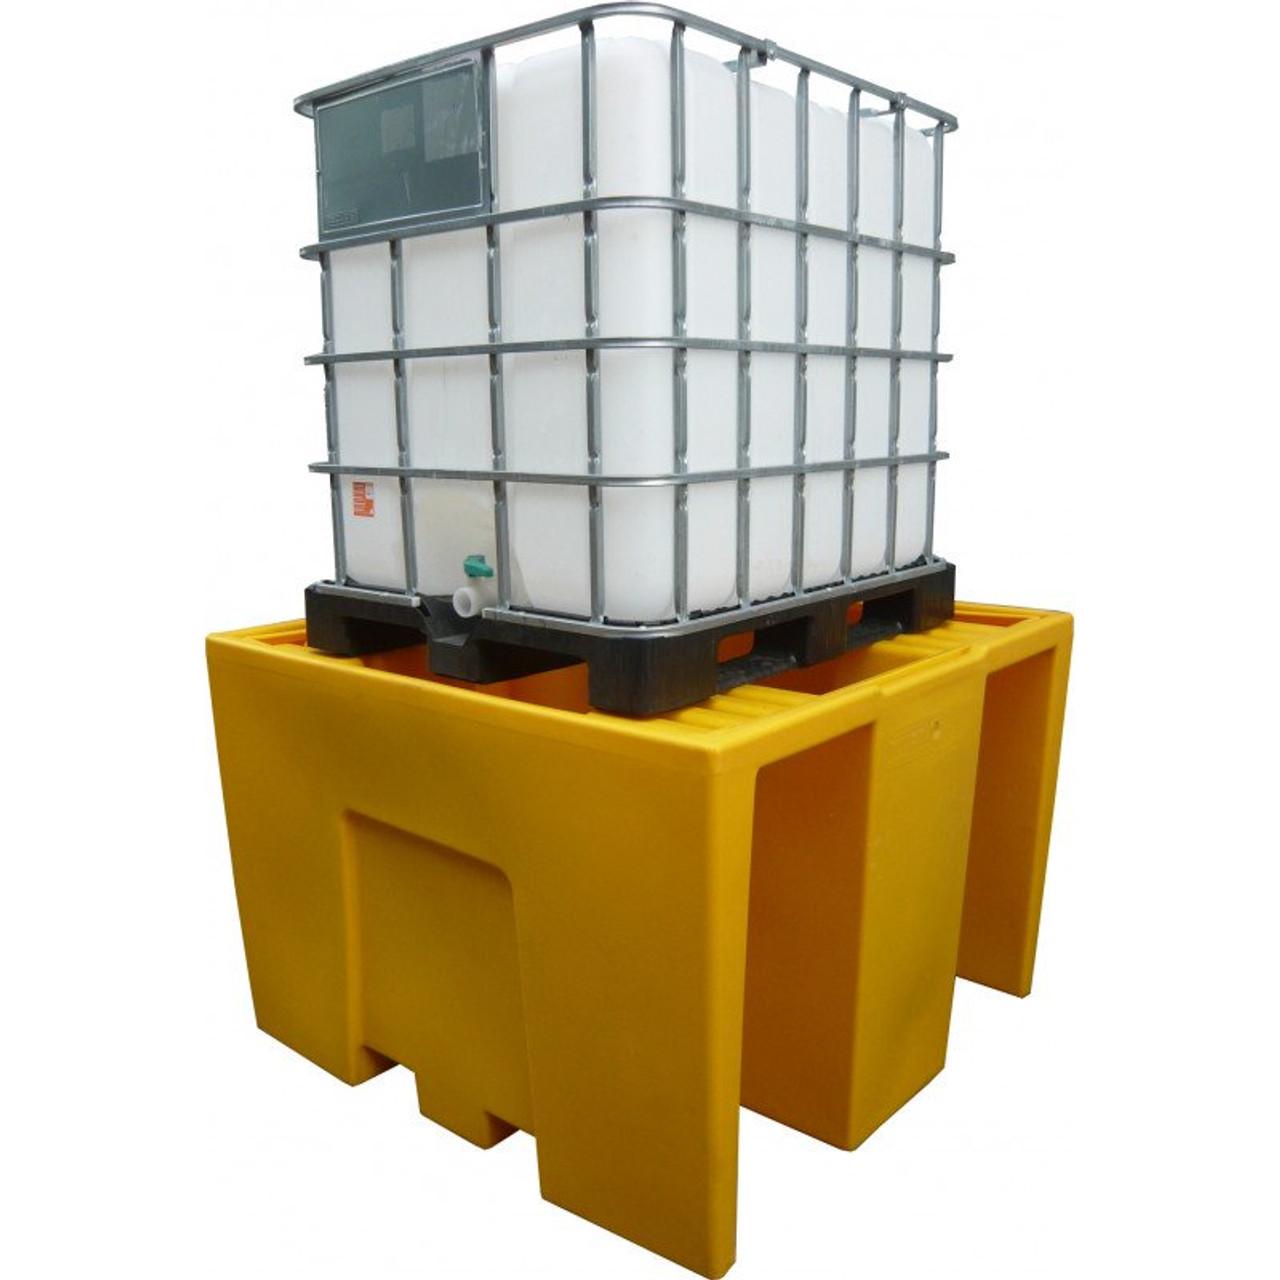 Jumbo IBC storage tank pallet spill containment bund / stand